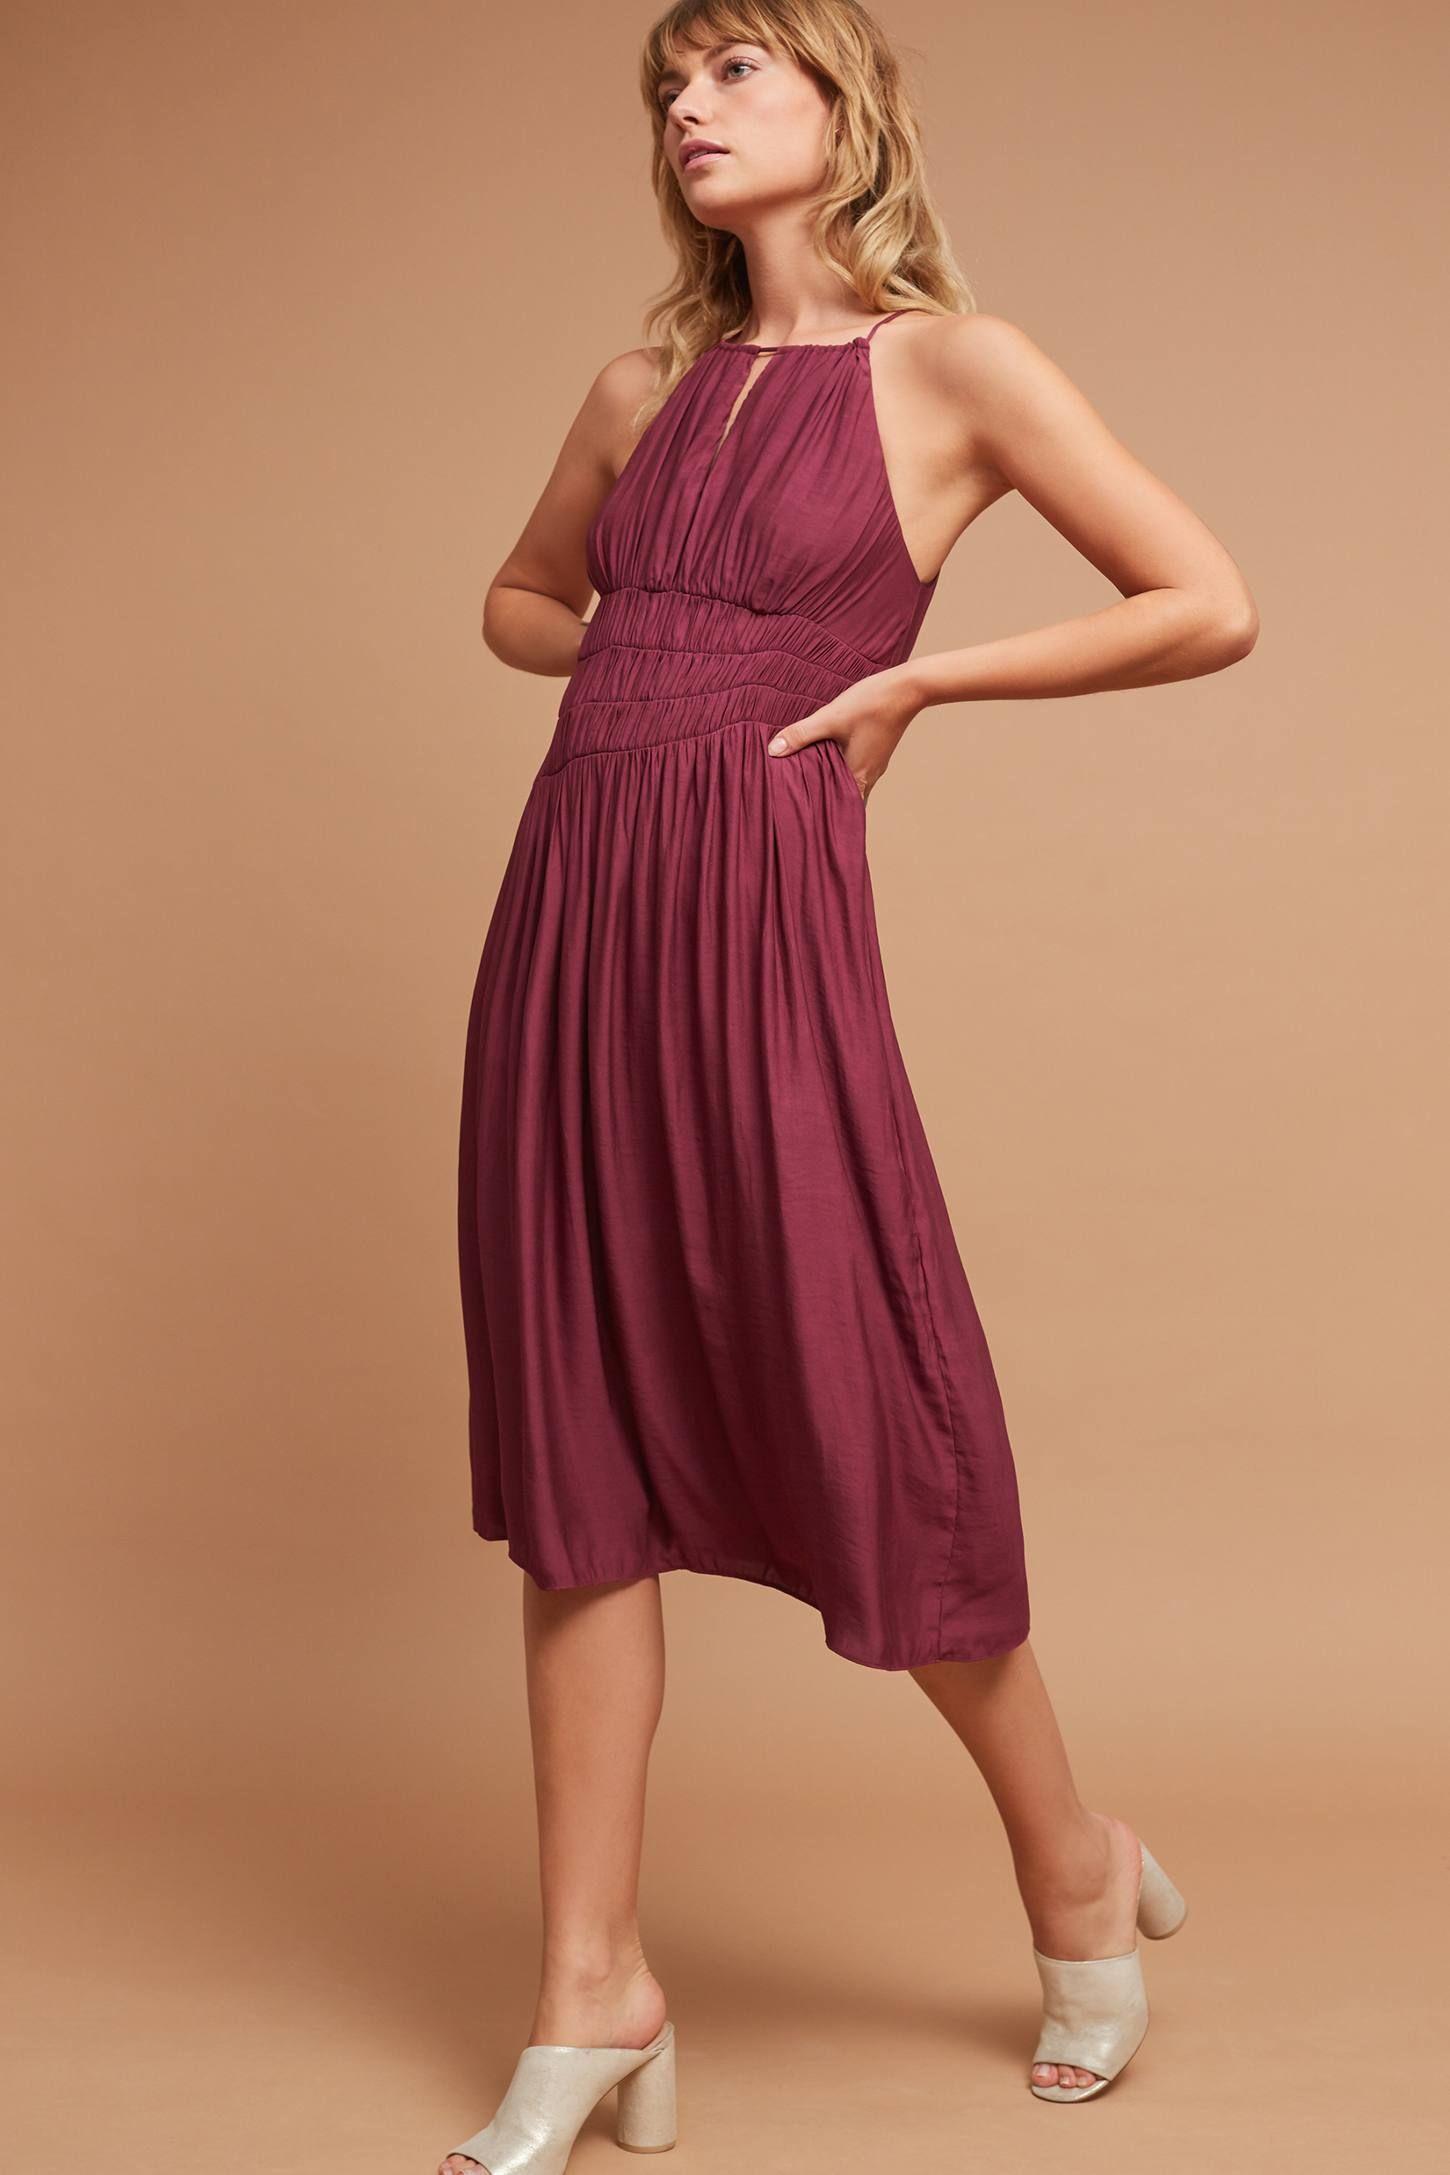 Slide View: 2: Smocked Halter Midi Dress